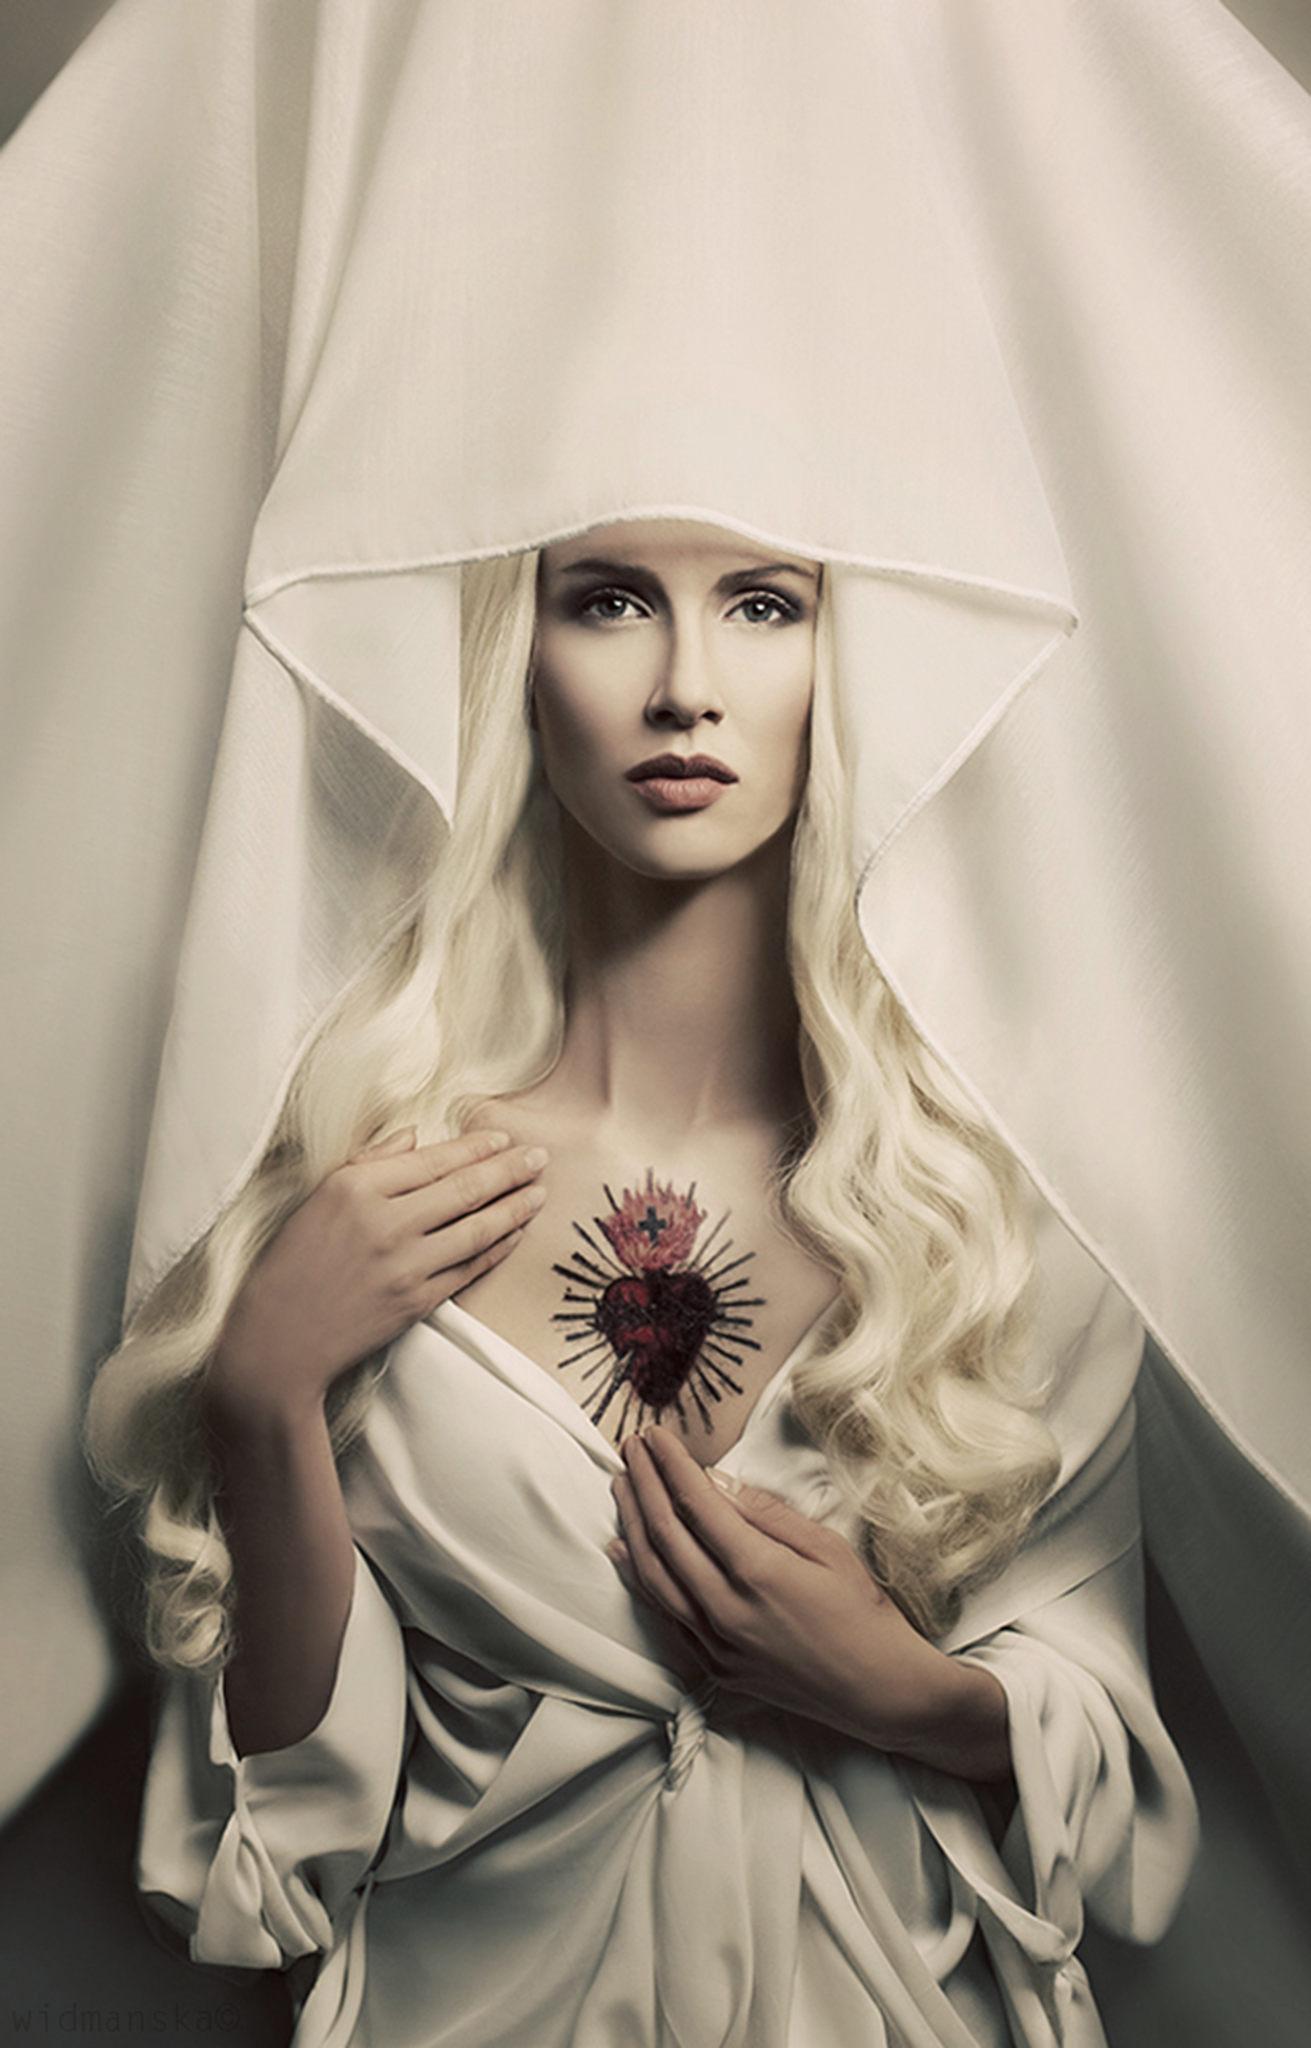 Biała Madonna, 2013